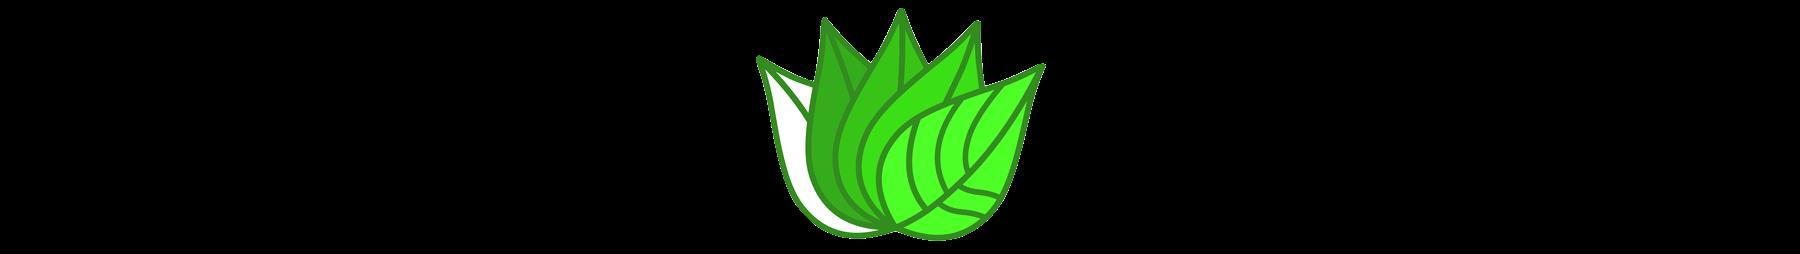 0_3 Leaf long.png